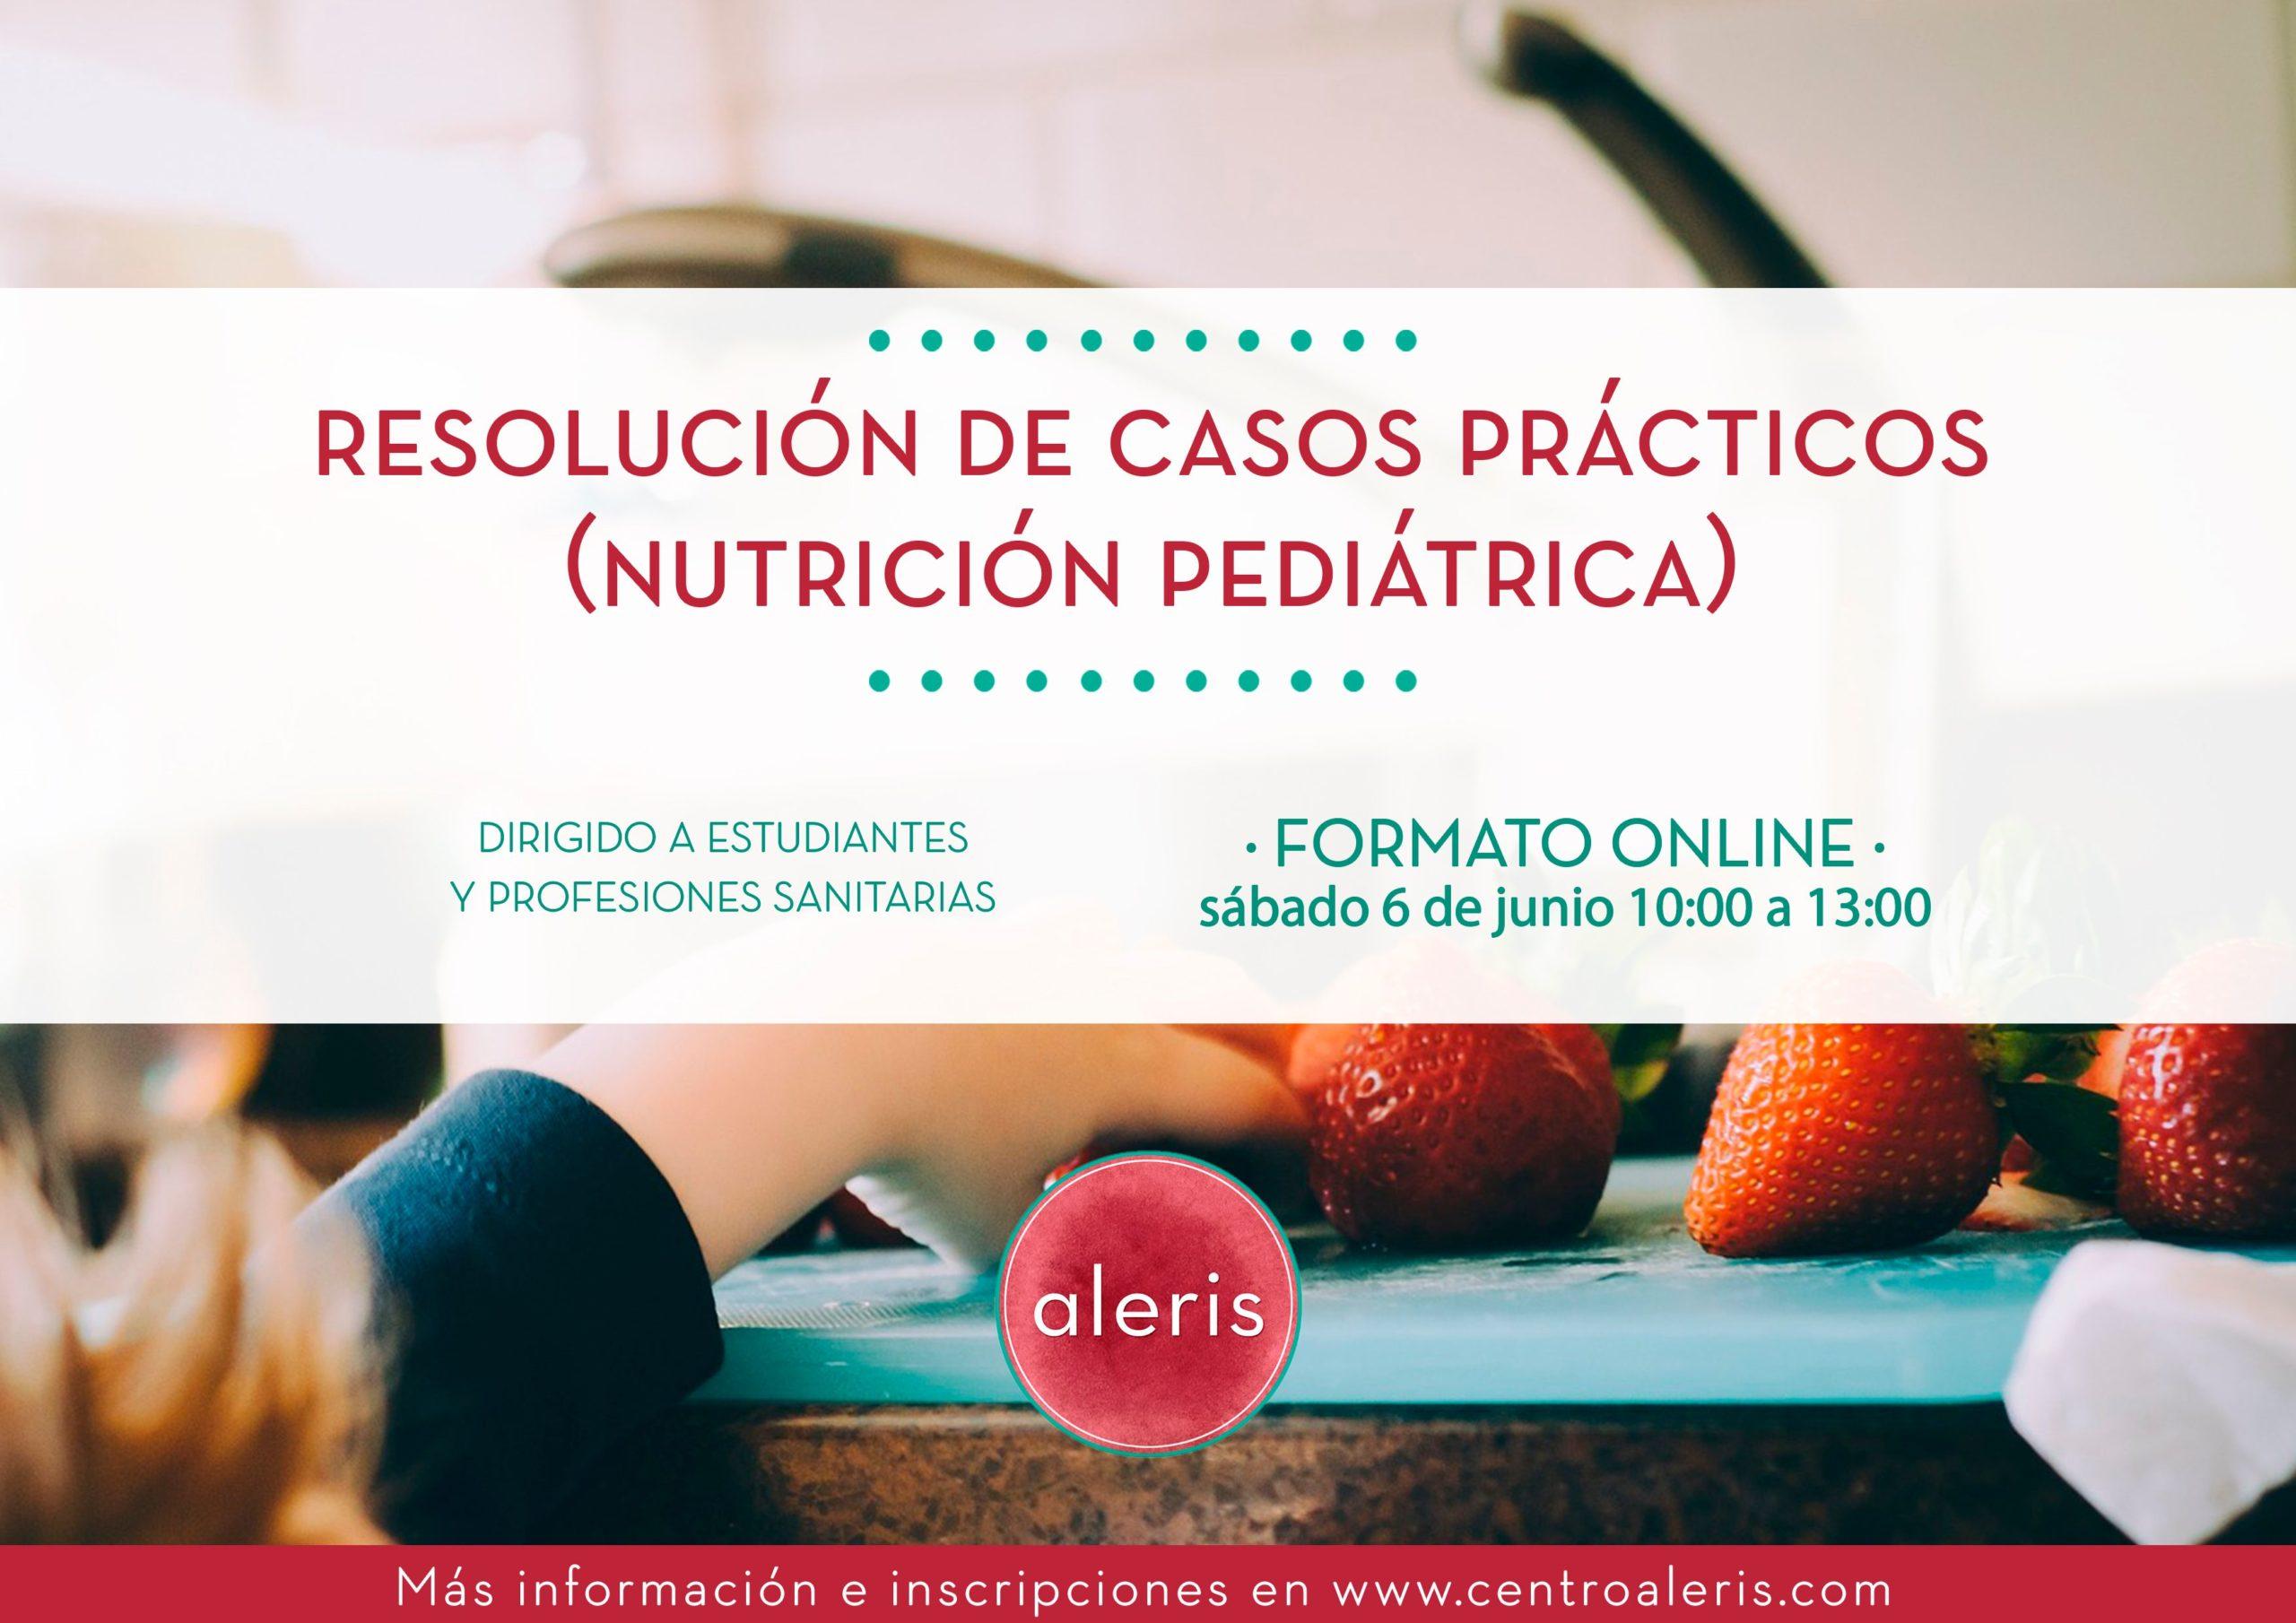 Casos prácticos (Nutrición pediátrica)